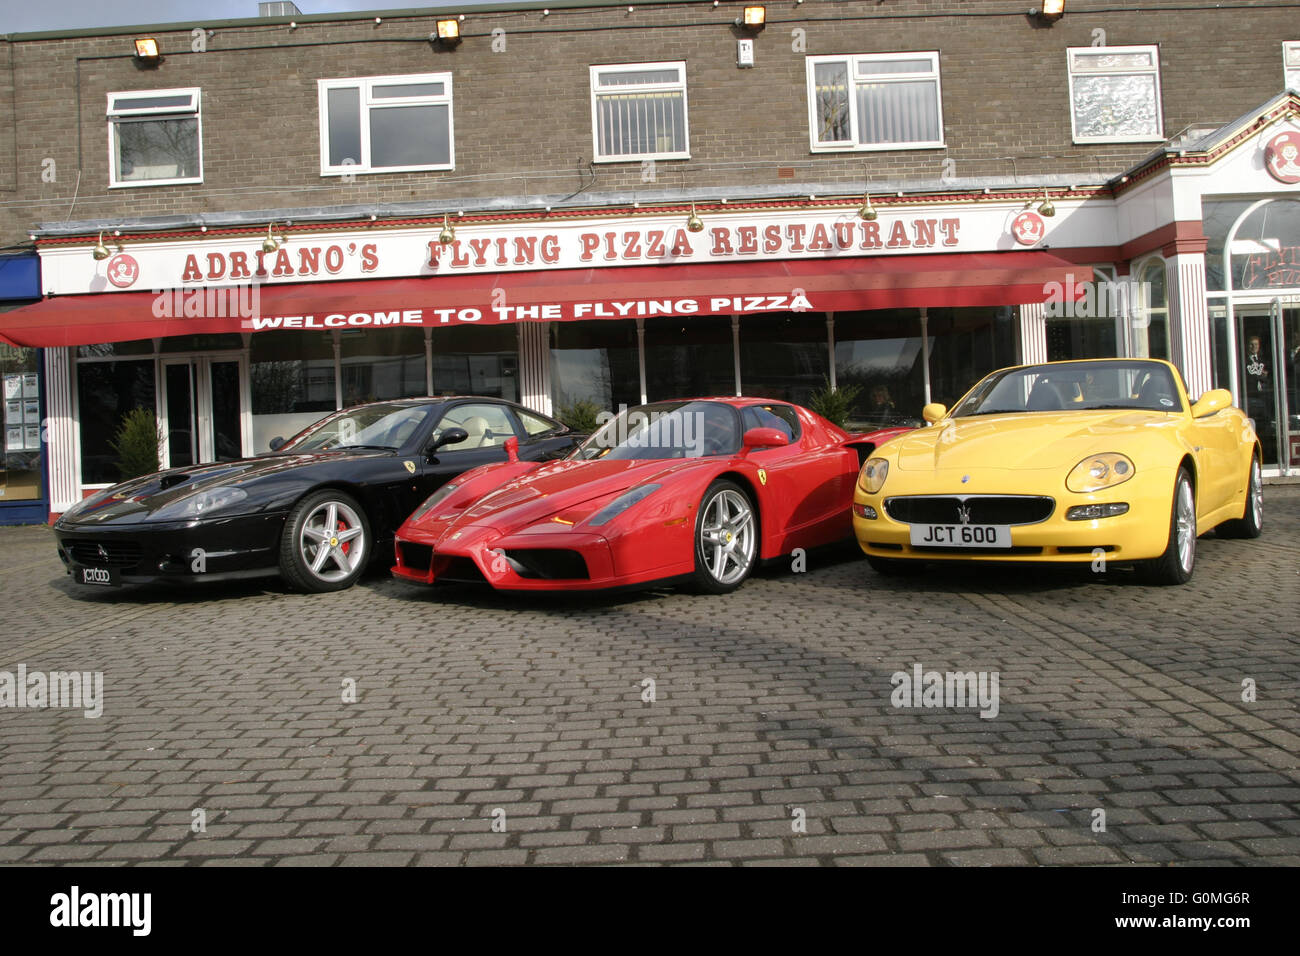 Ferrari 575M Maranello F1, Ferrari Enzo & Maserati Cambiocorsa at the Flying Pizza, Leeds. Stock Photo